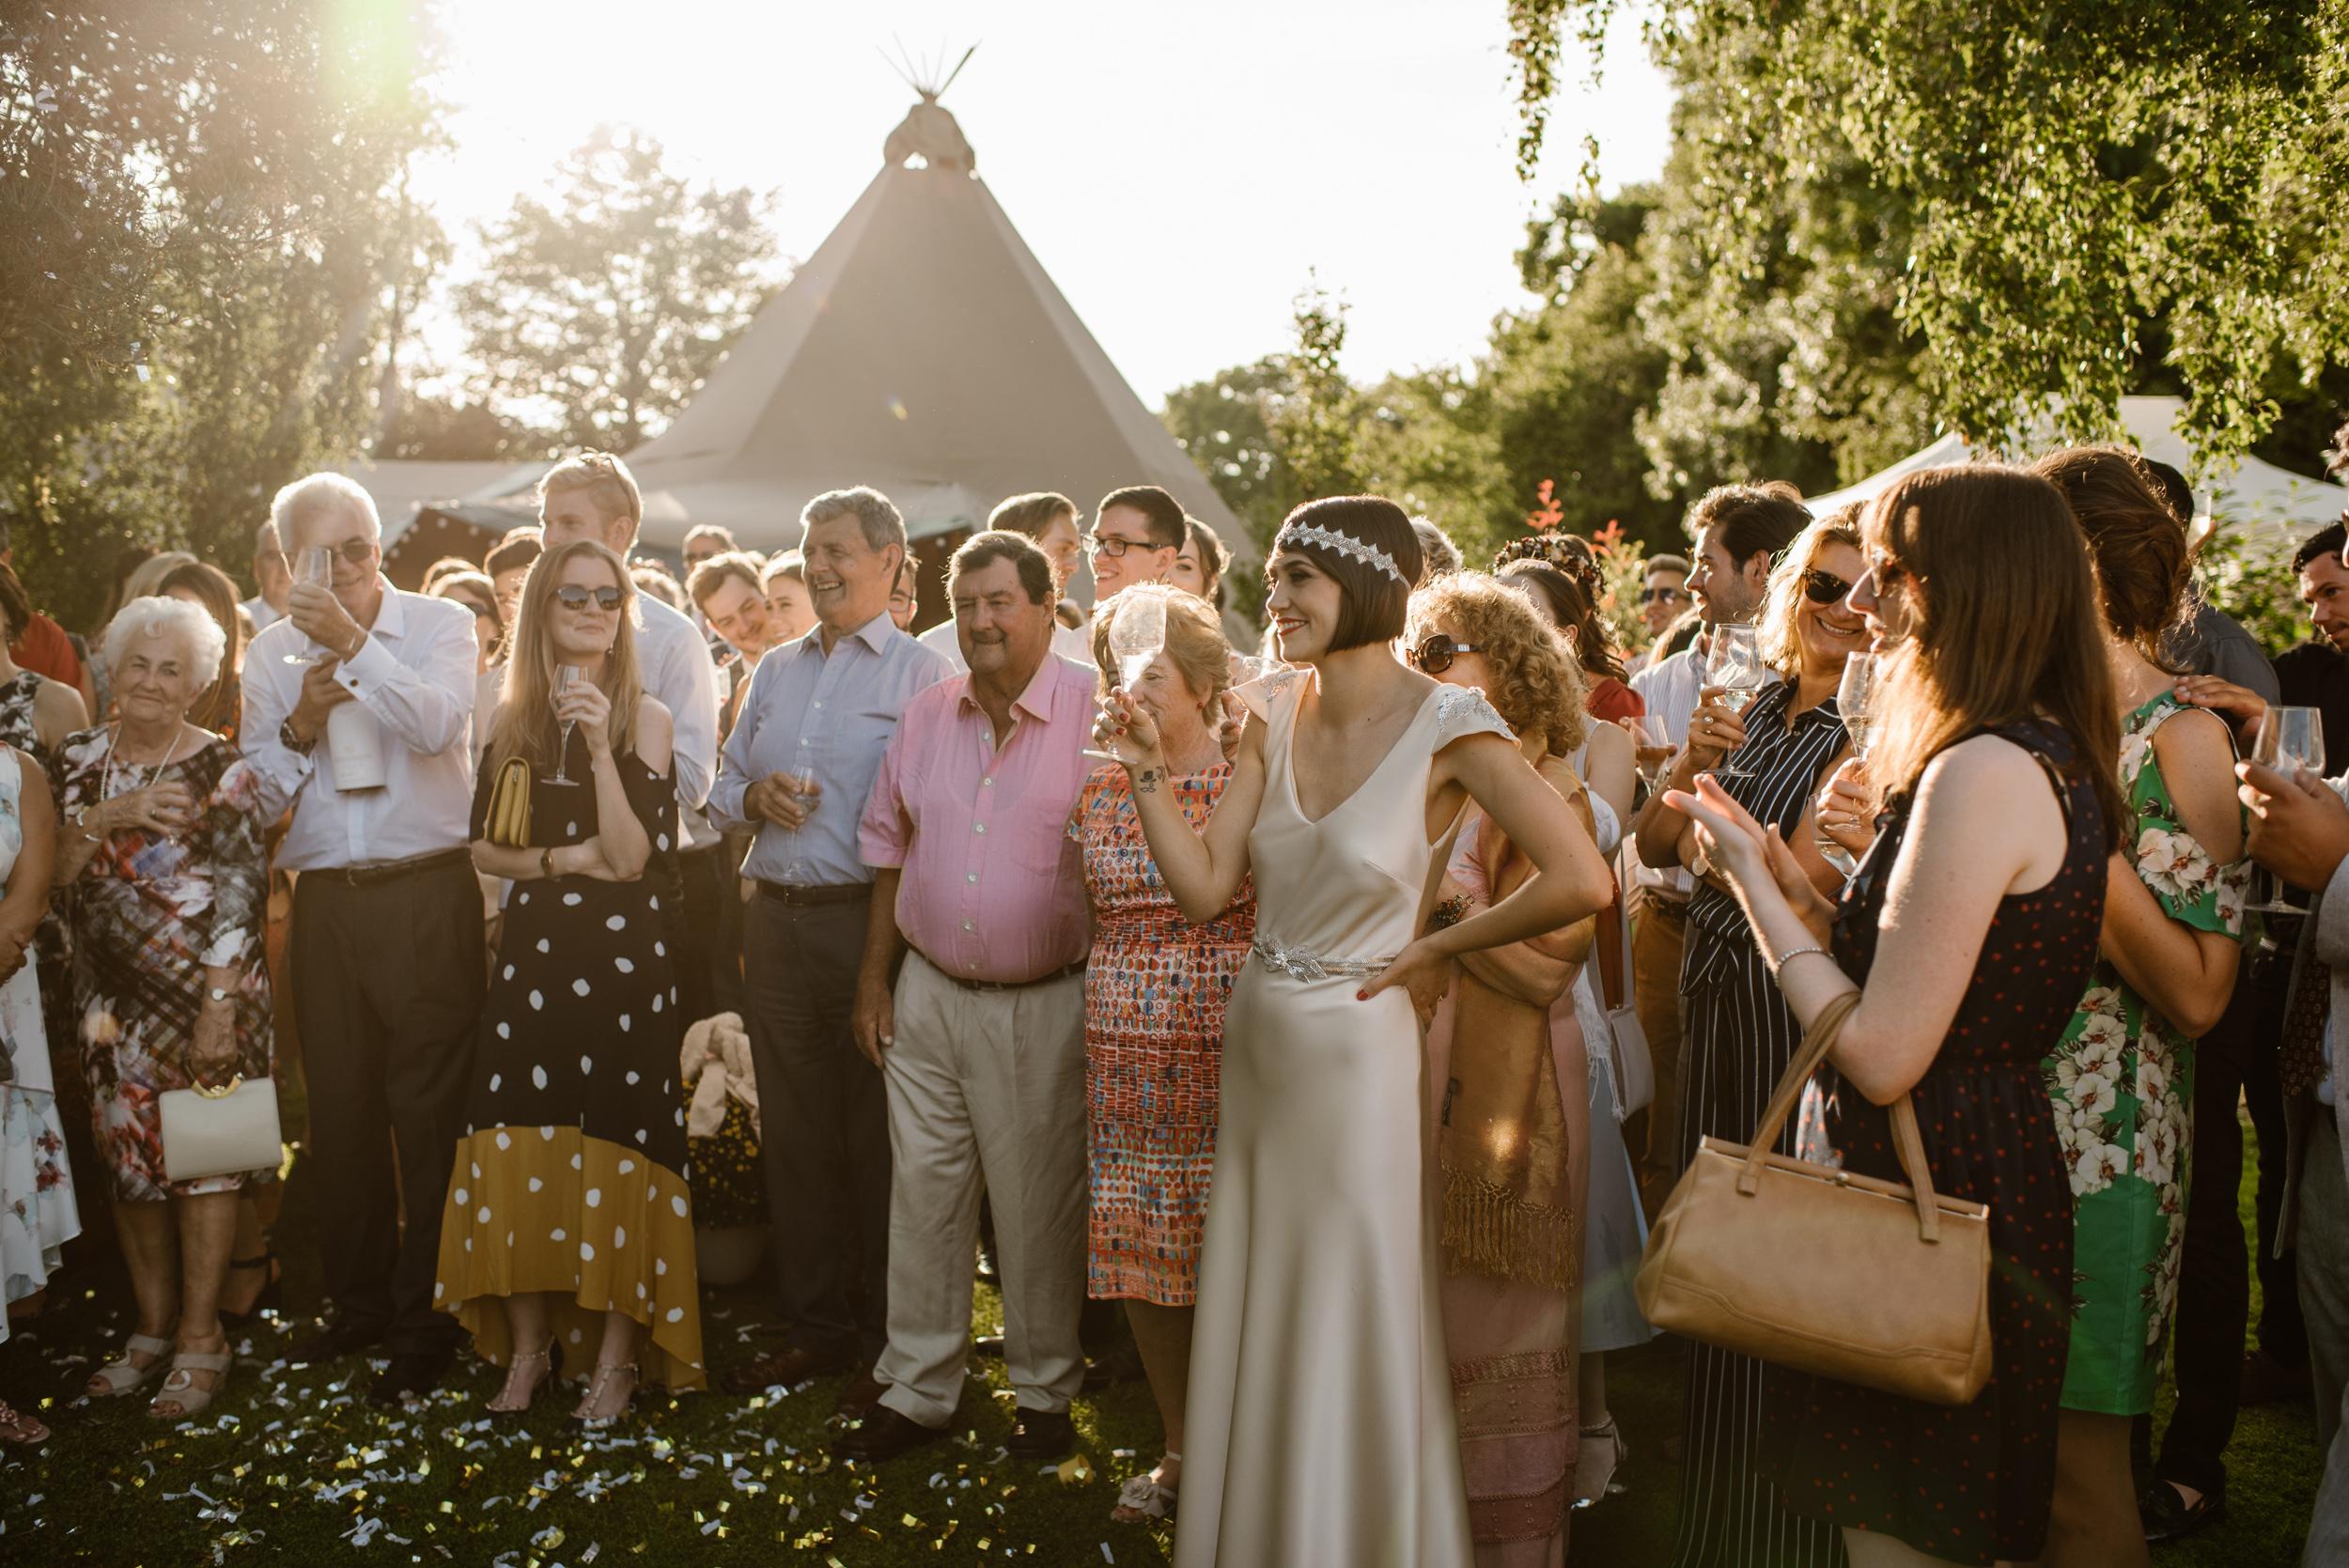 Ro-Kate-Beaumont-bias-cut-silk-wedding-gown-back-garden-wedding-by-Ellie-Gillard-23.jpg